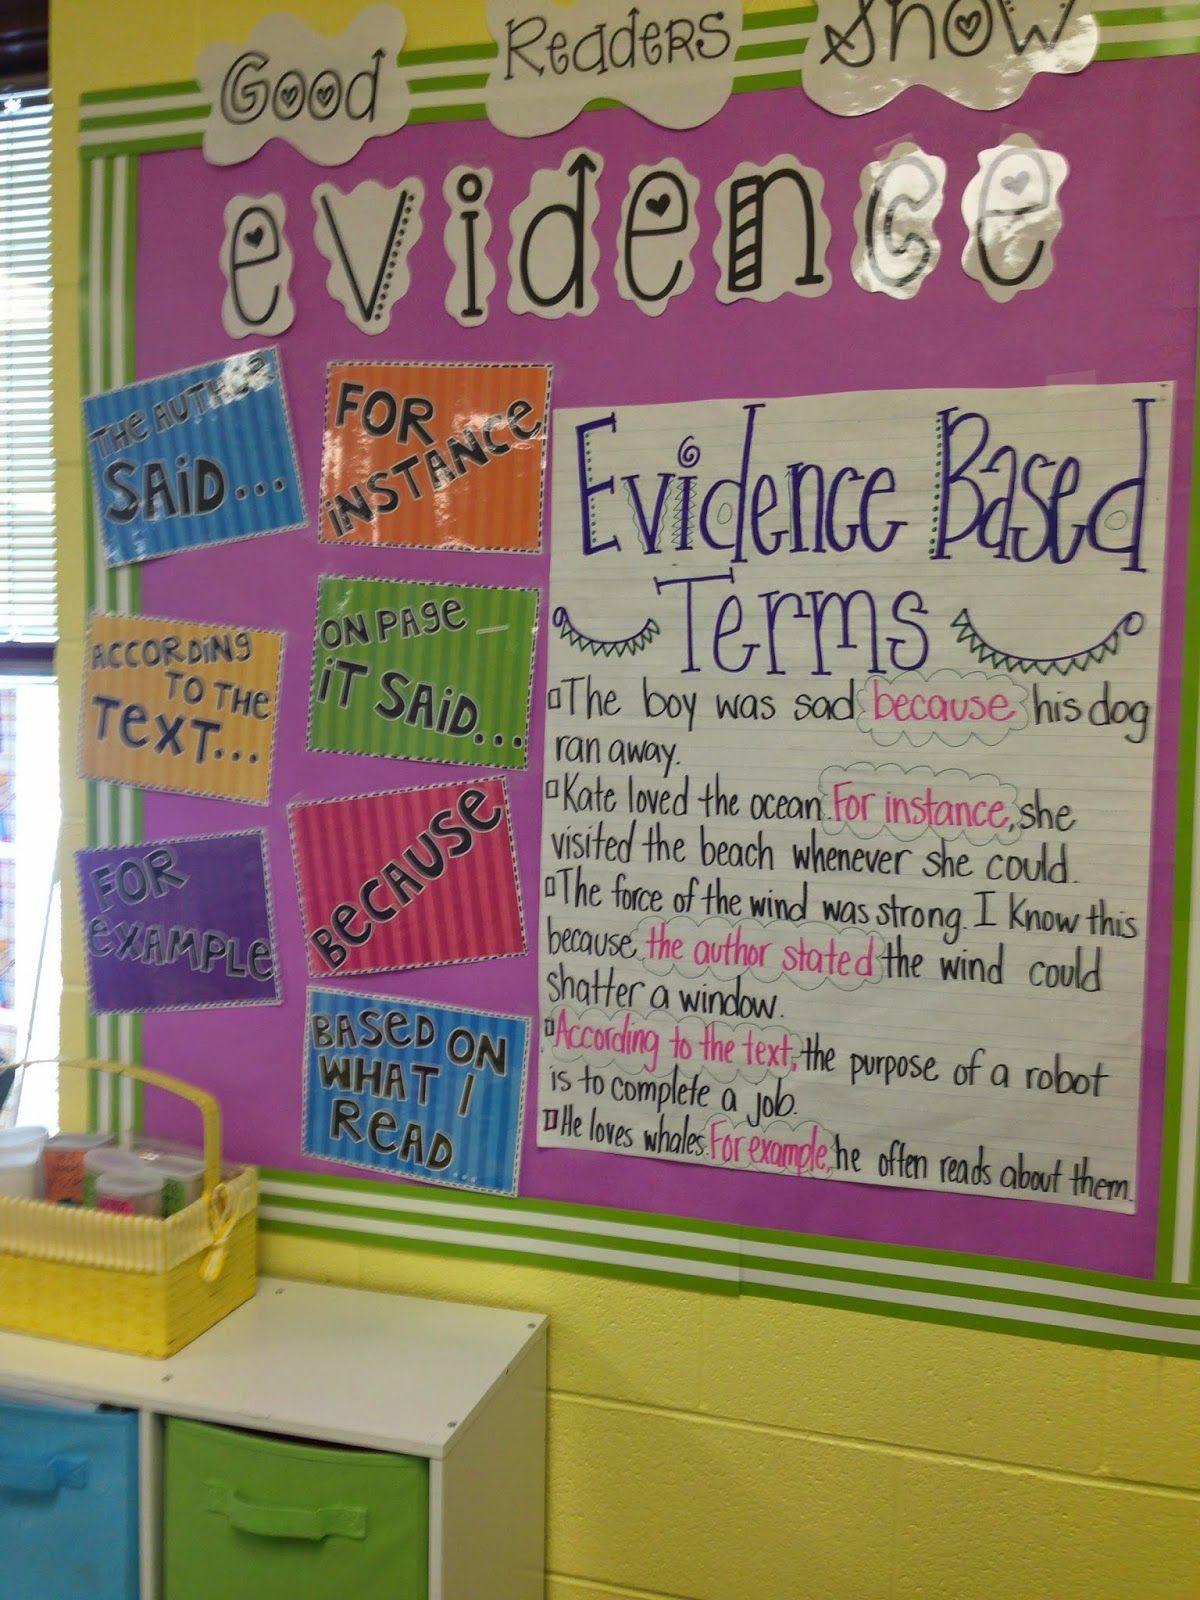 Showing Evidence Freebies